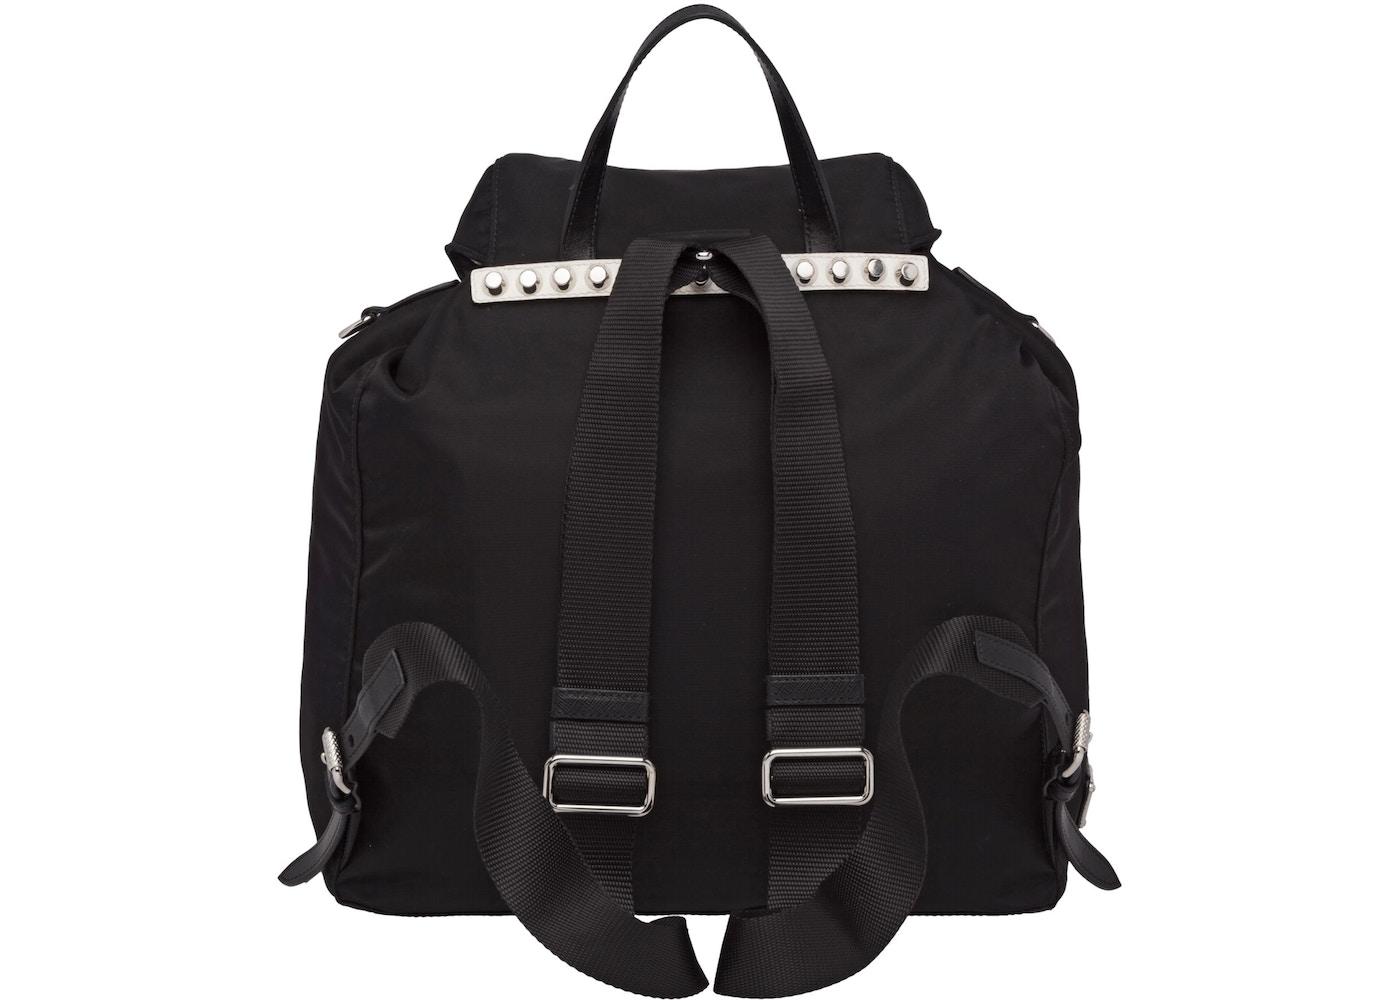 f740f6d4de6 Buy & Sell Prada Handbags - New Highest Bids